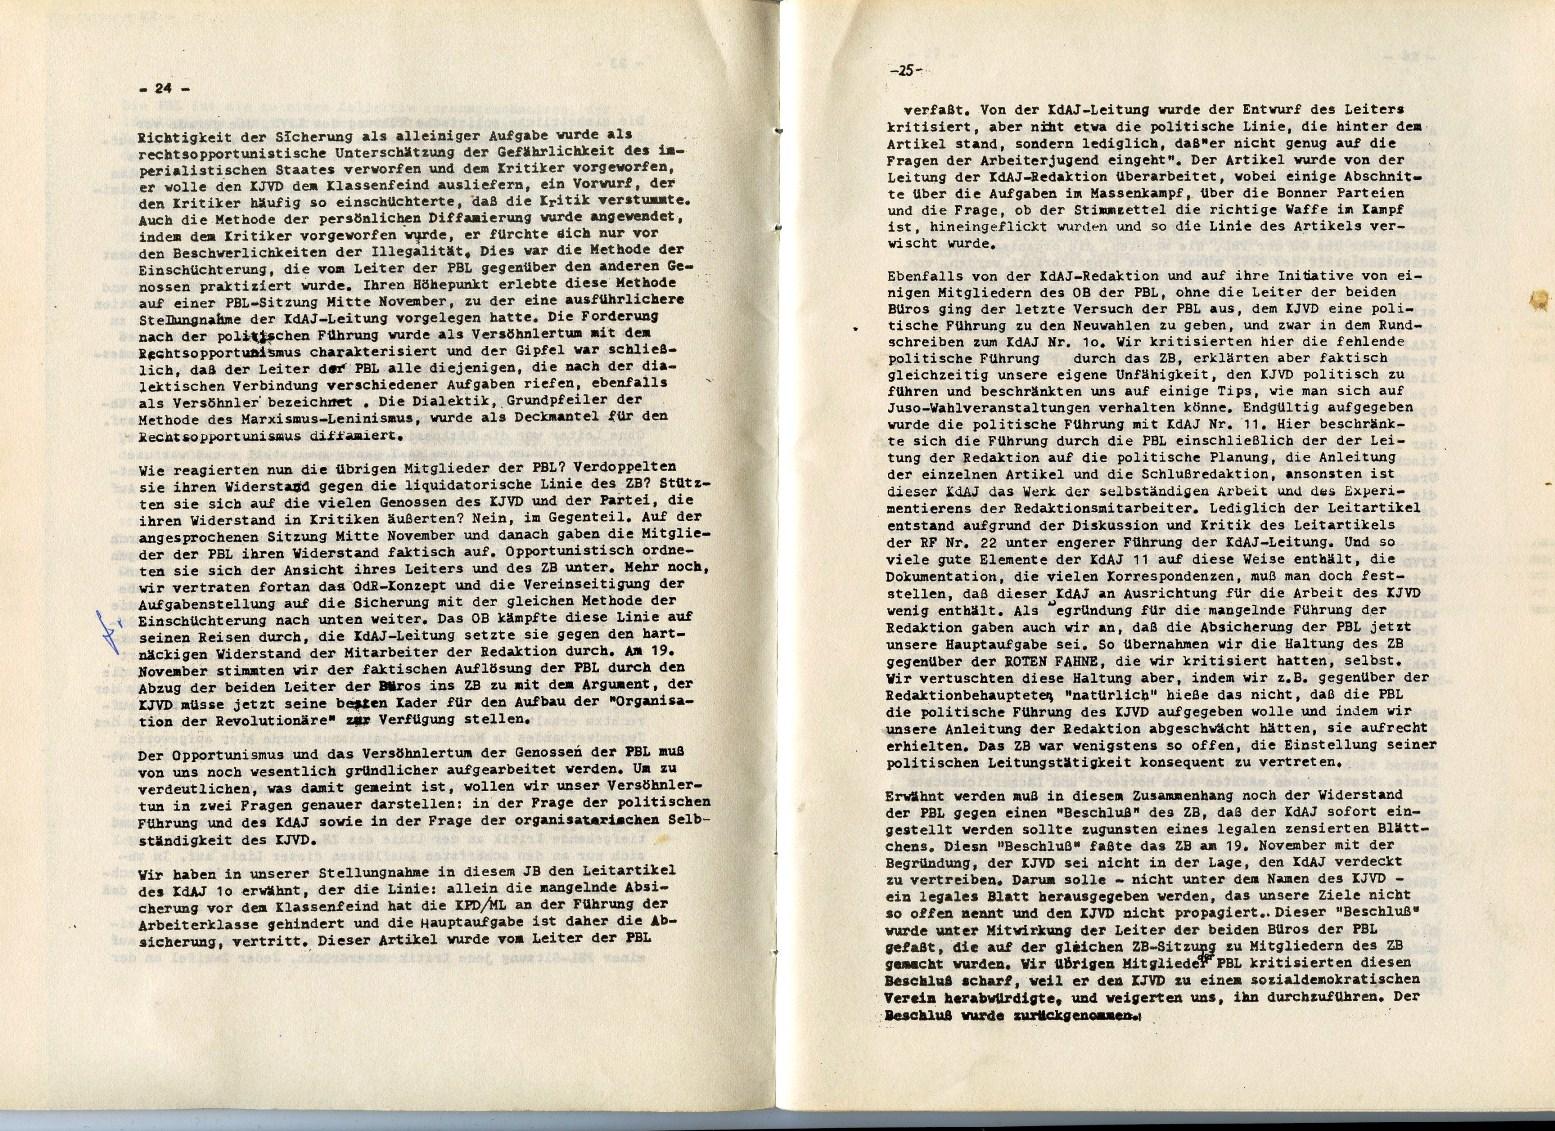 ZB_Universitas_1972_16